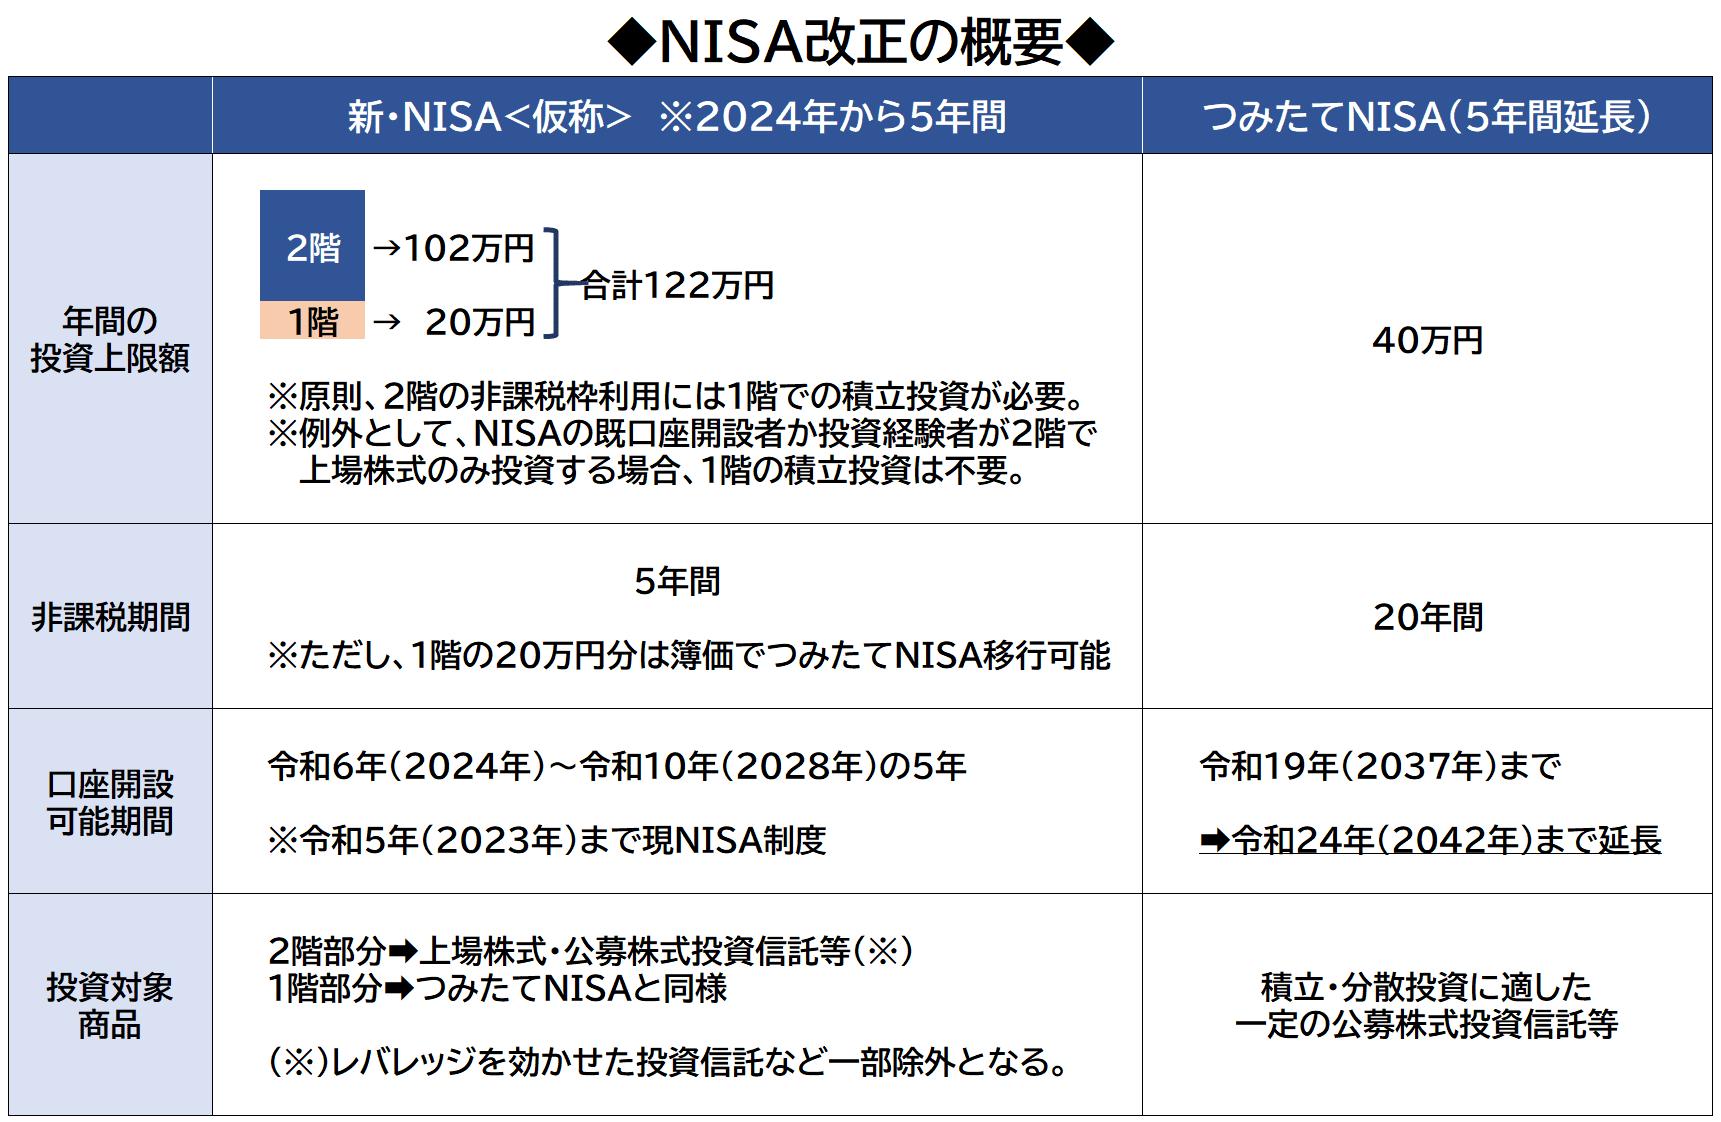 新・NISA制度概要